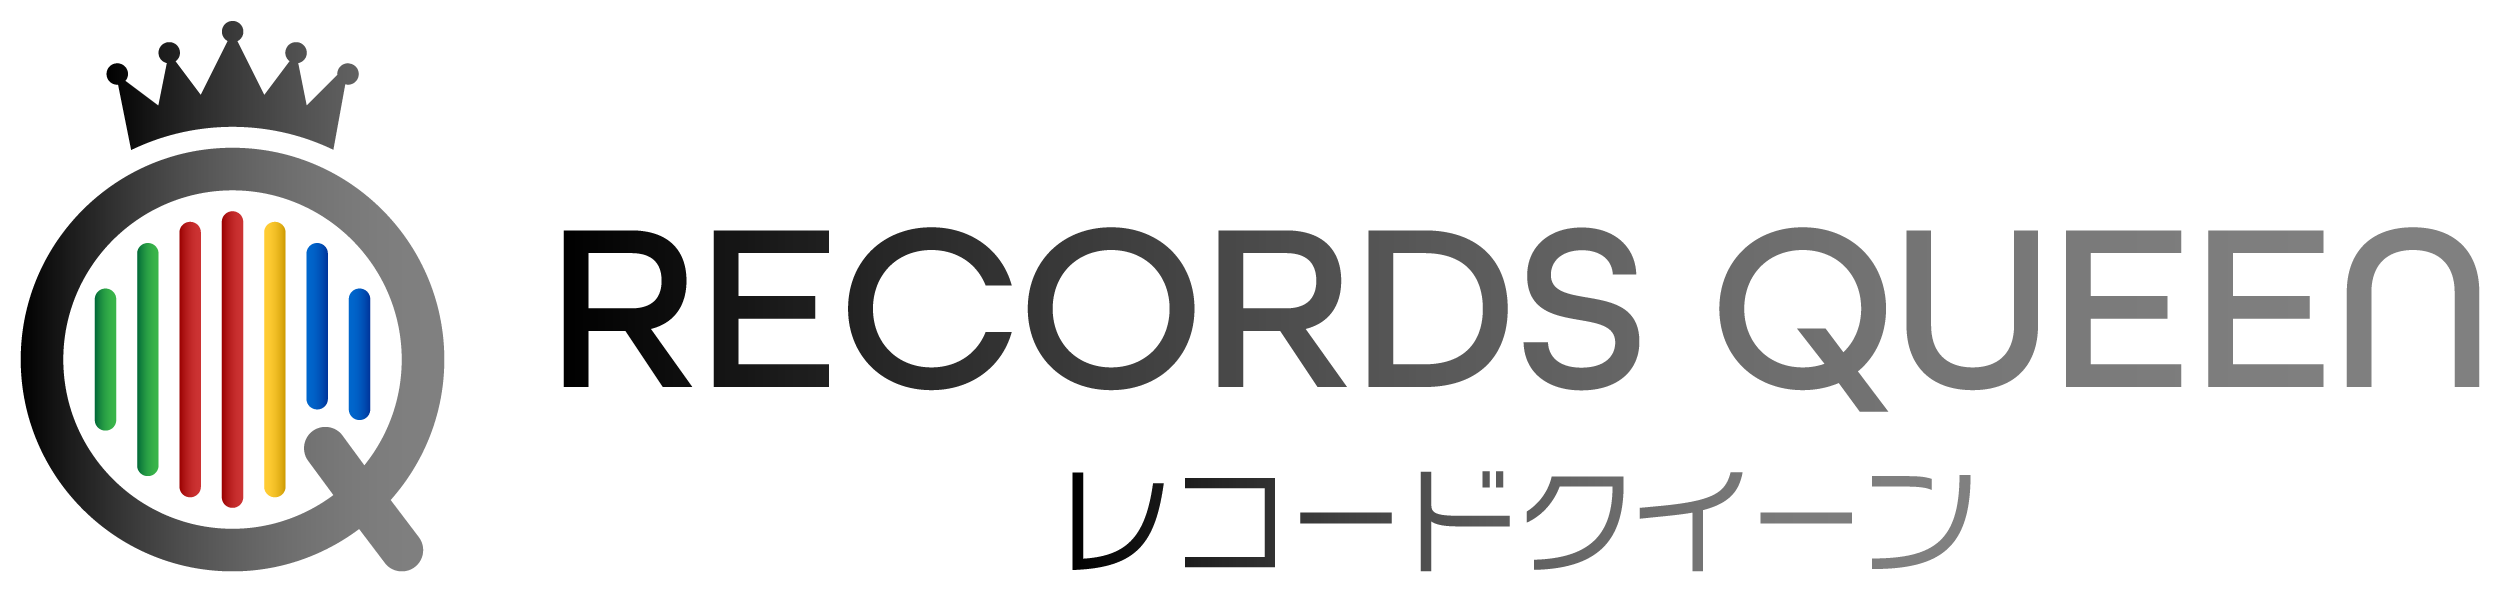 RECORDS QUEEN | レコードクイーン 公式サイト